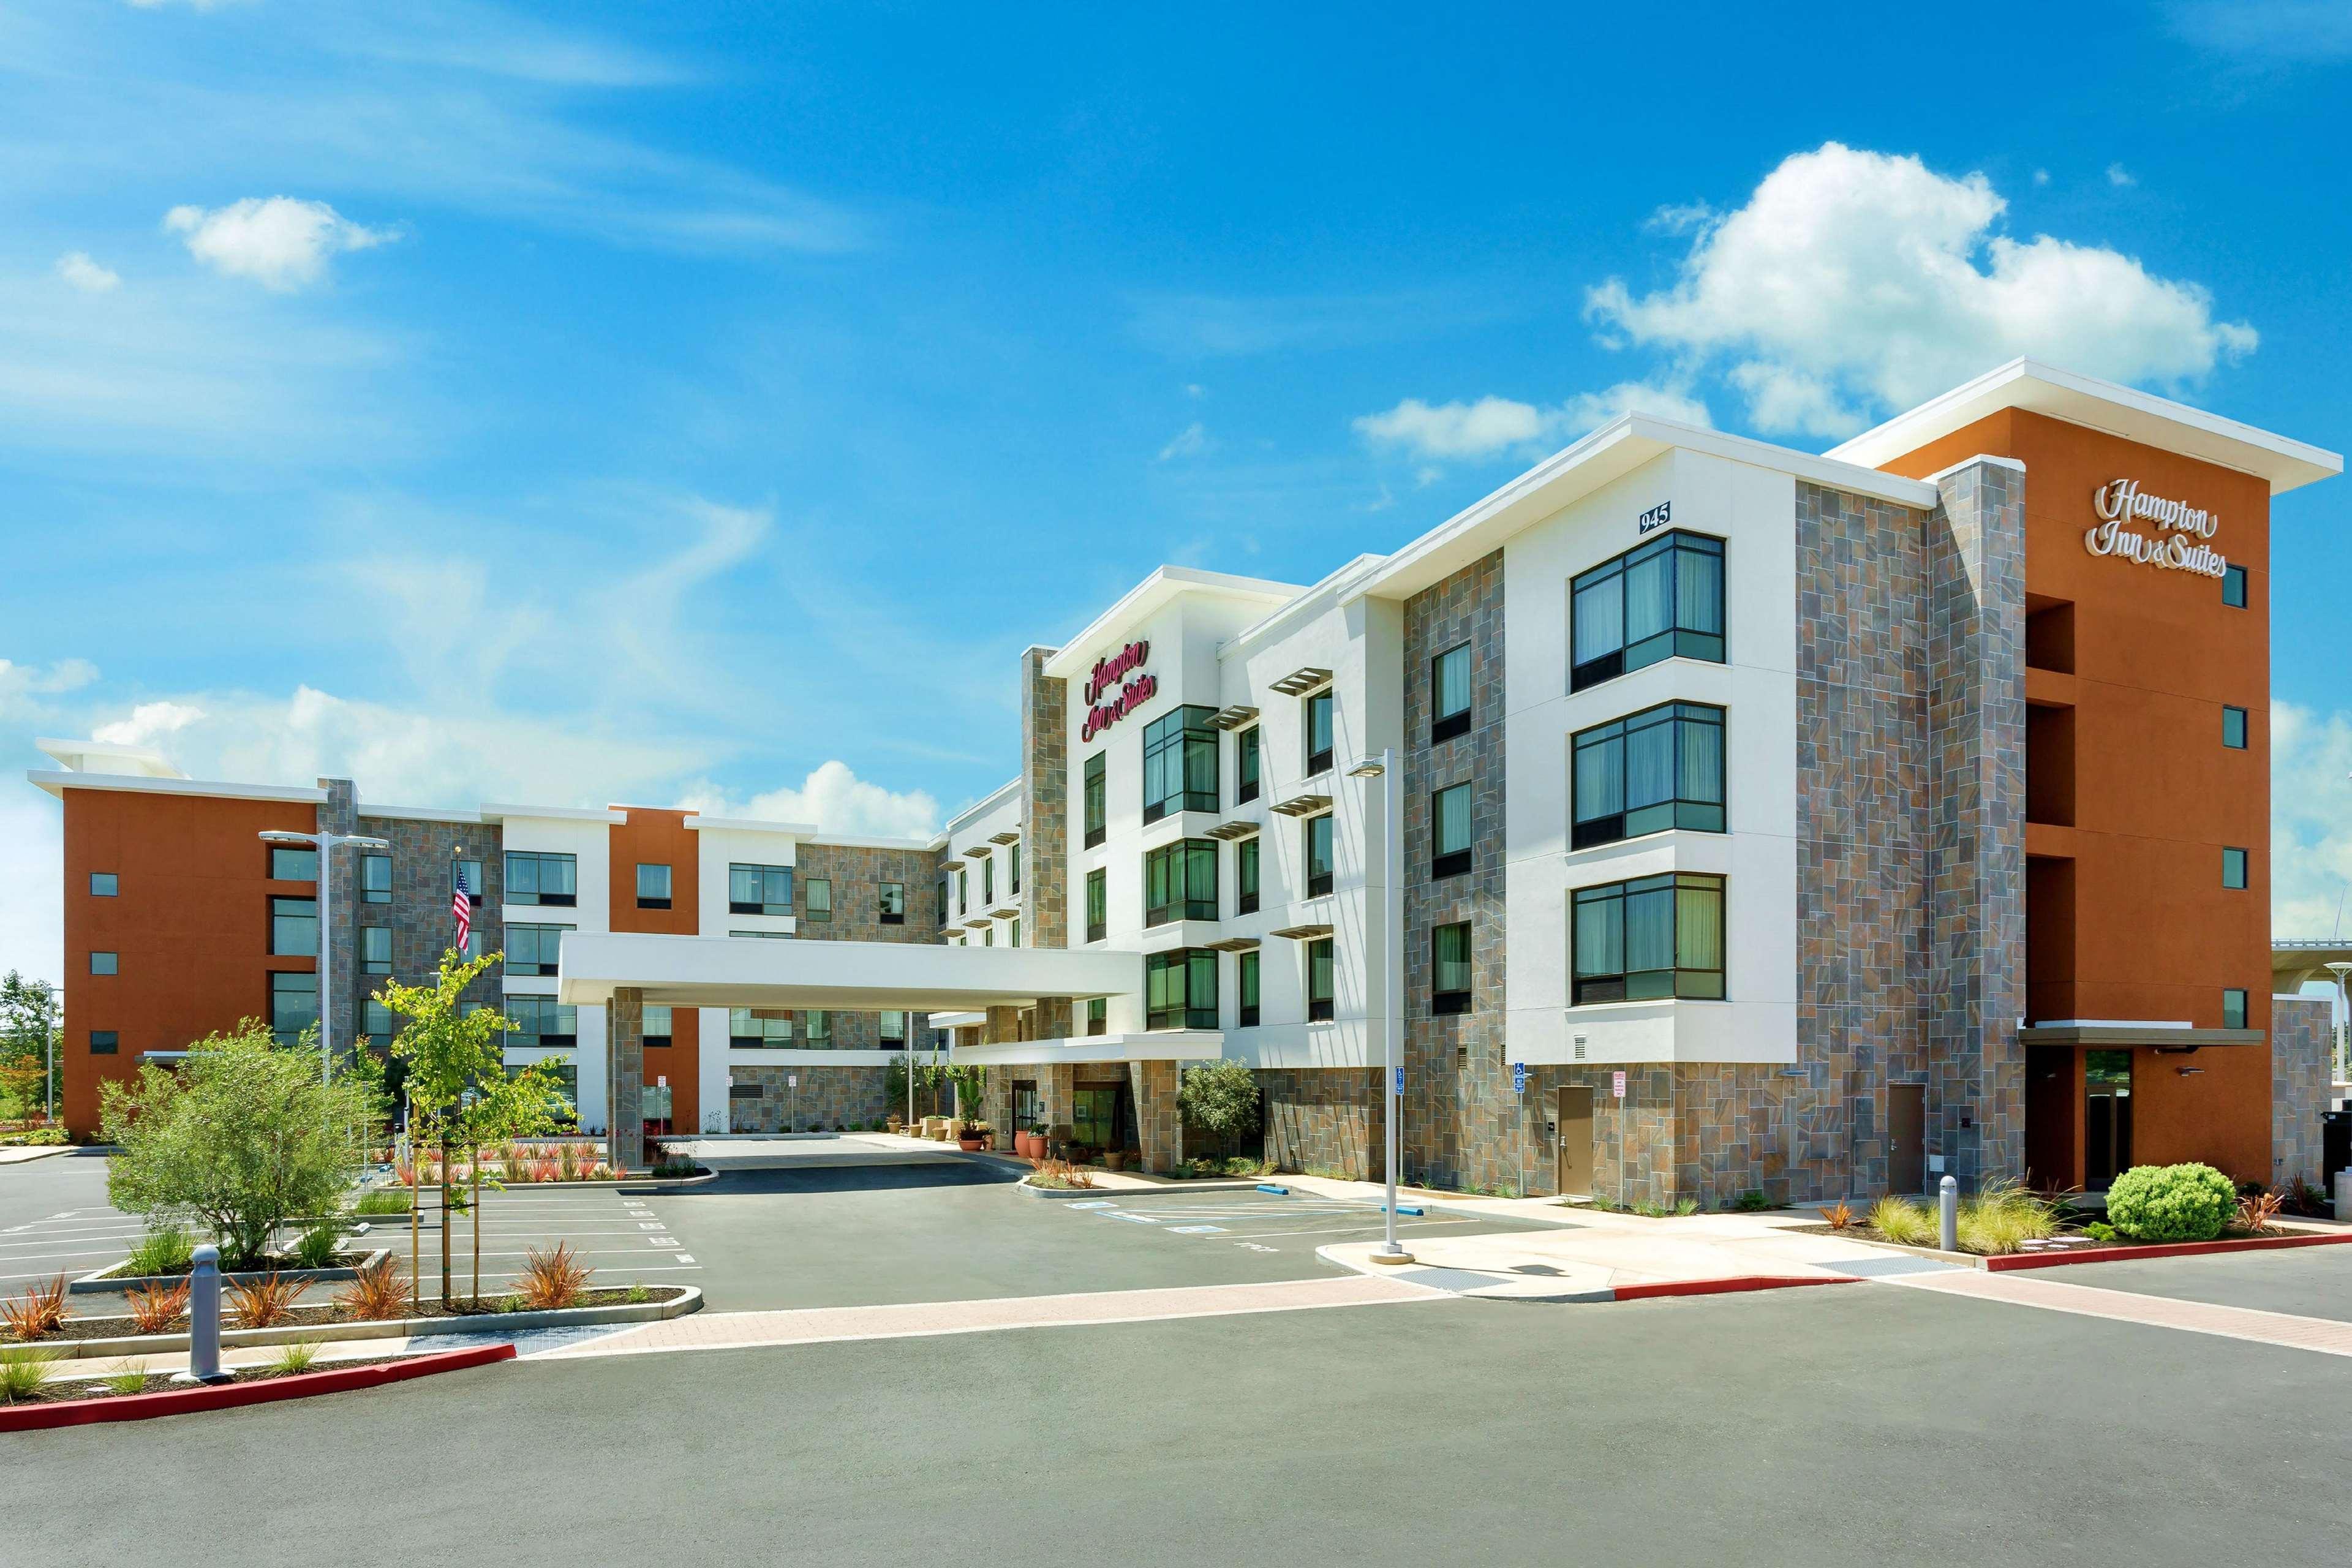 Hampton Inn & Suites Napa image 0